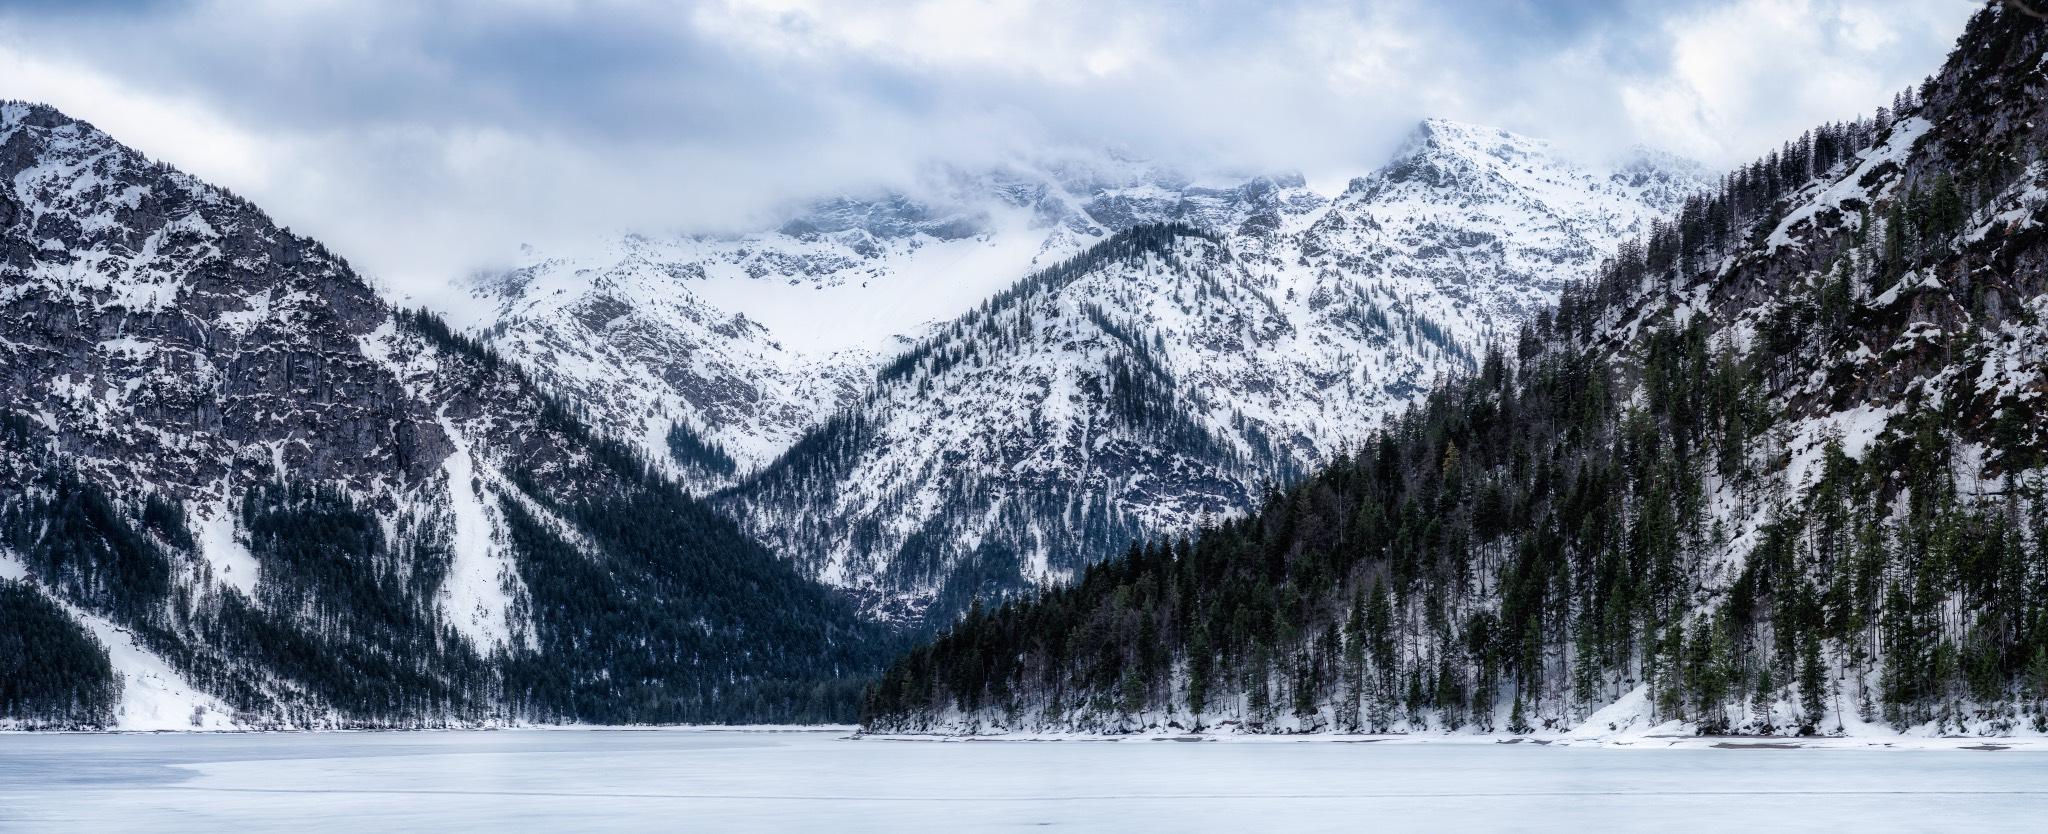 Plansee, Tyrol (southern mountain view), Austria